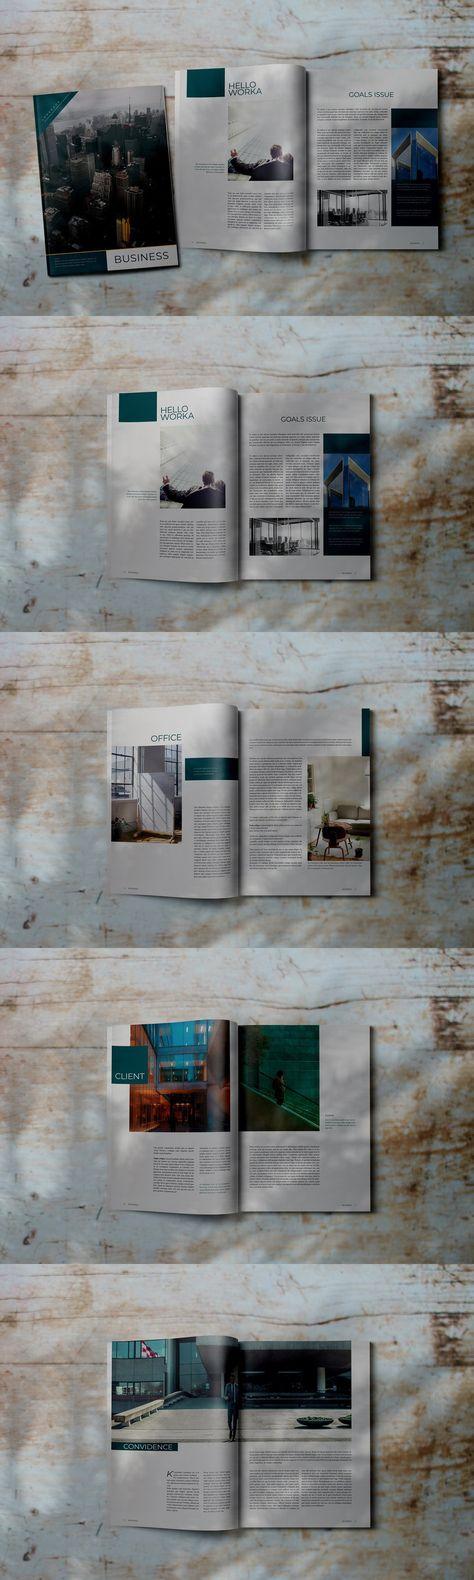 Business - Indesign Lookbook Magz